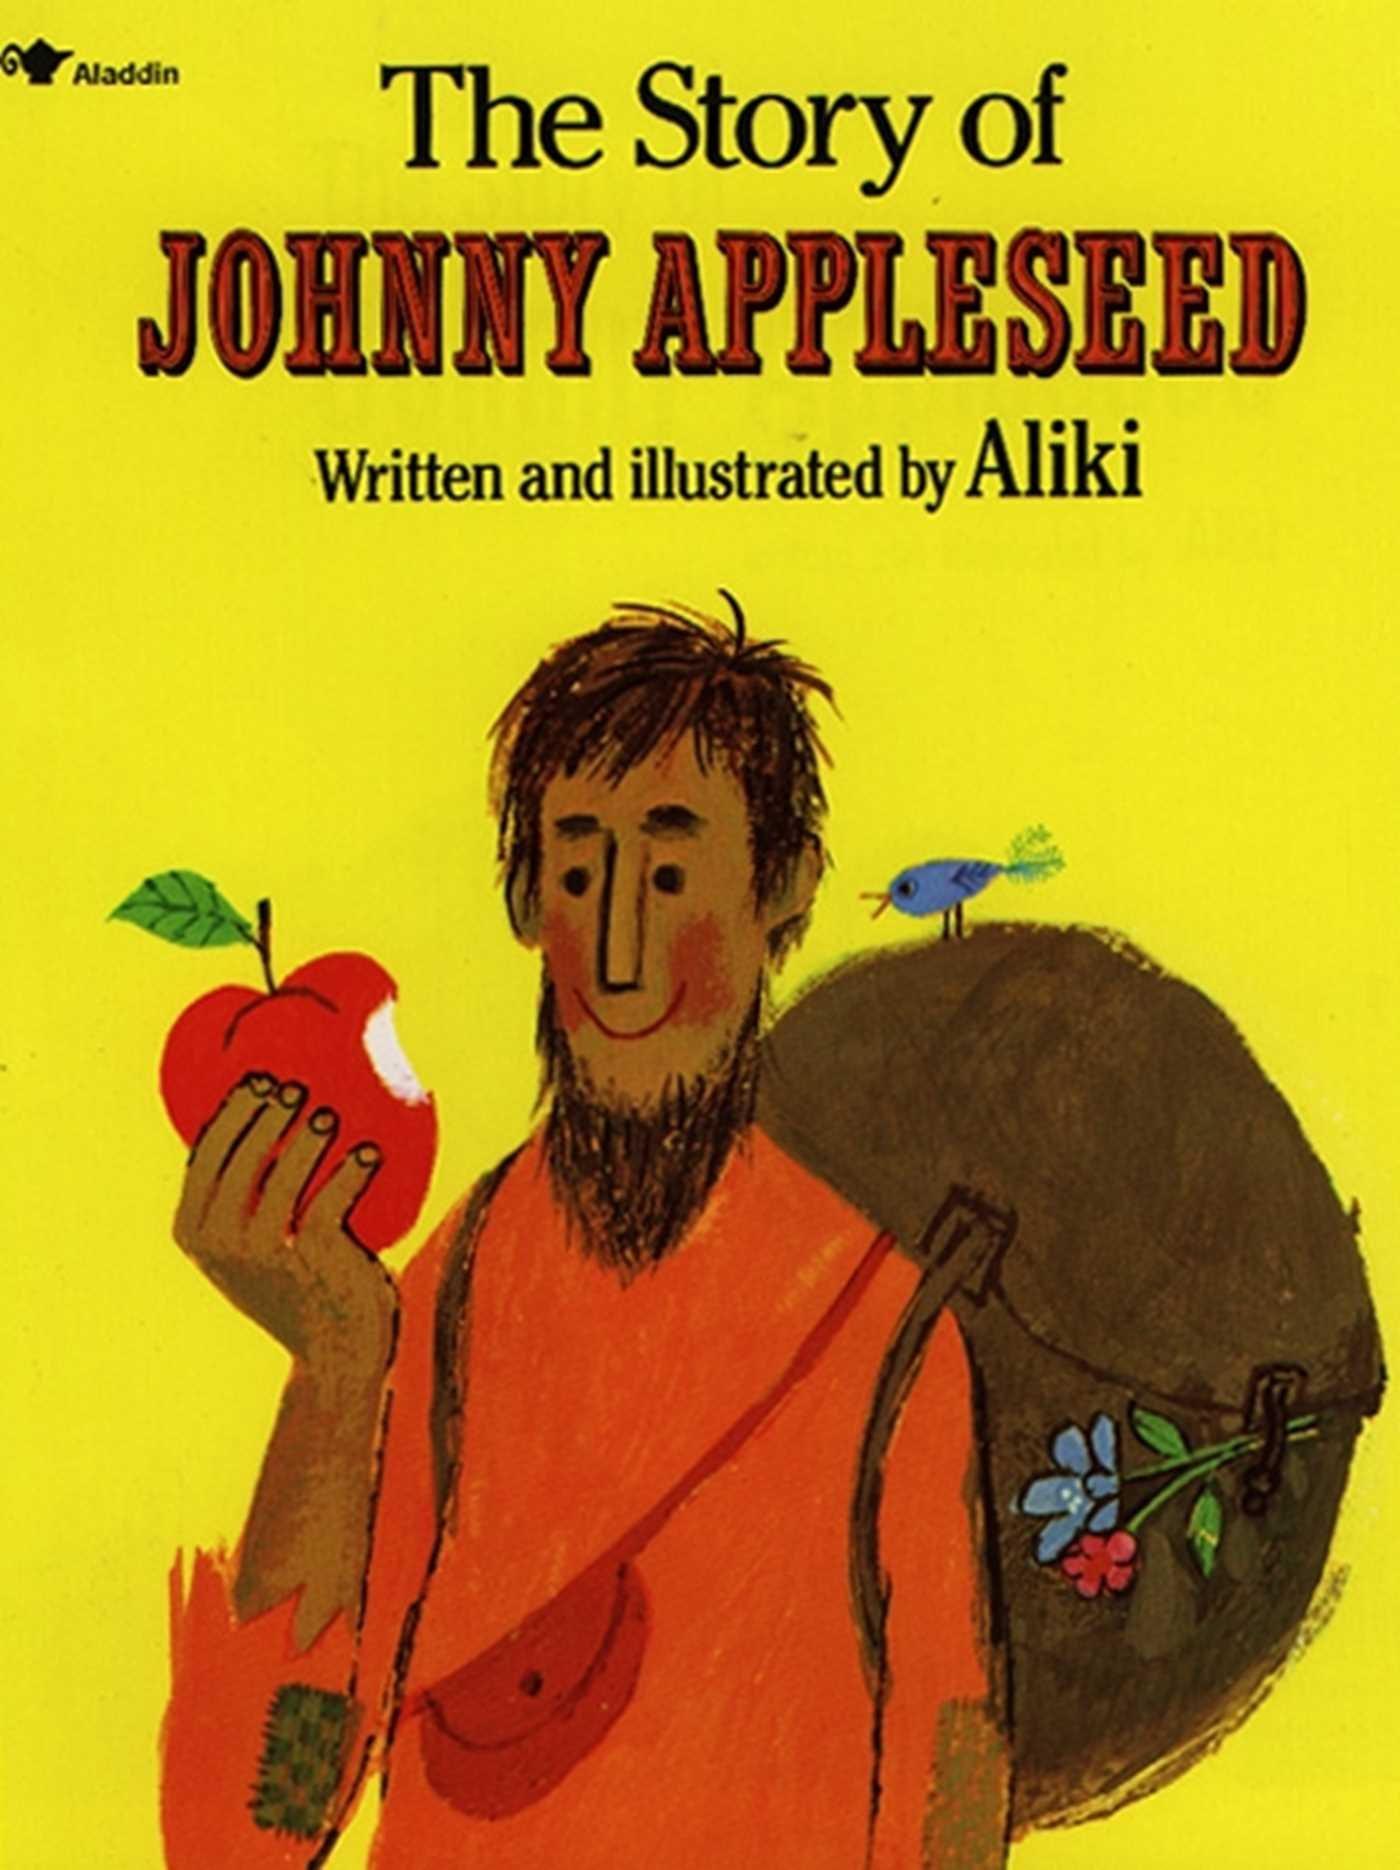 The Story Of Johnny Appleseed Aliki 9780671667467 Amazoncom Books